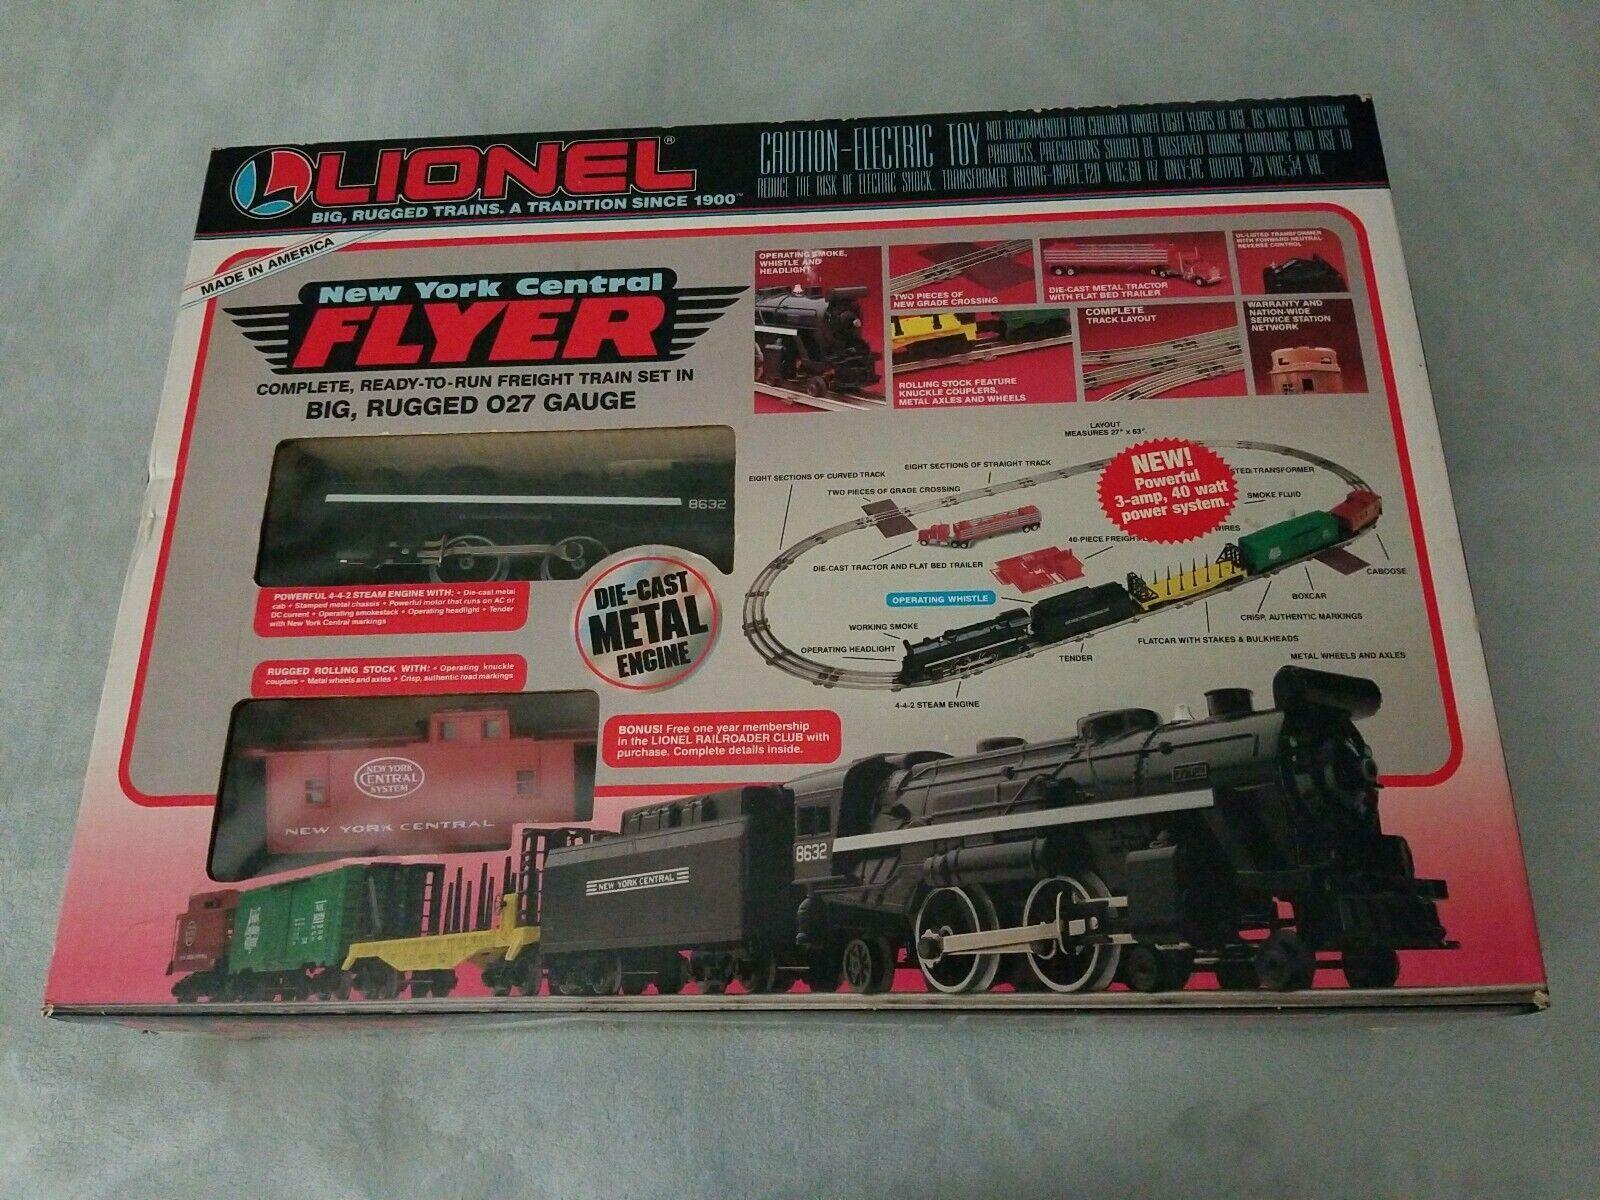 Lionel New York Central Flyer O27 Scale Train Set Box Complete 8632 4-4-2 1993